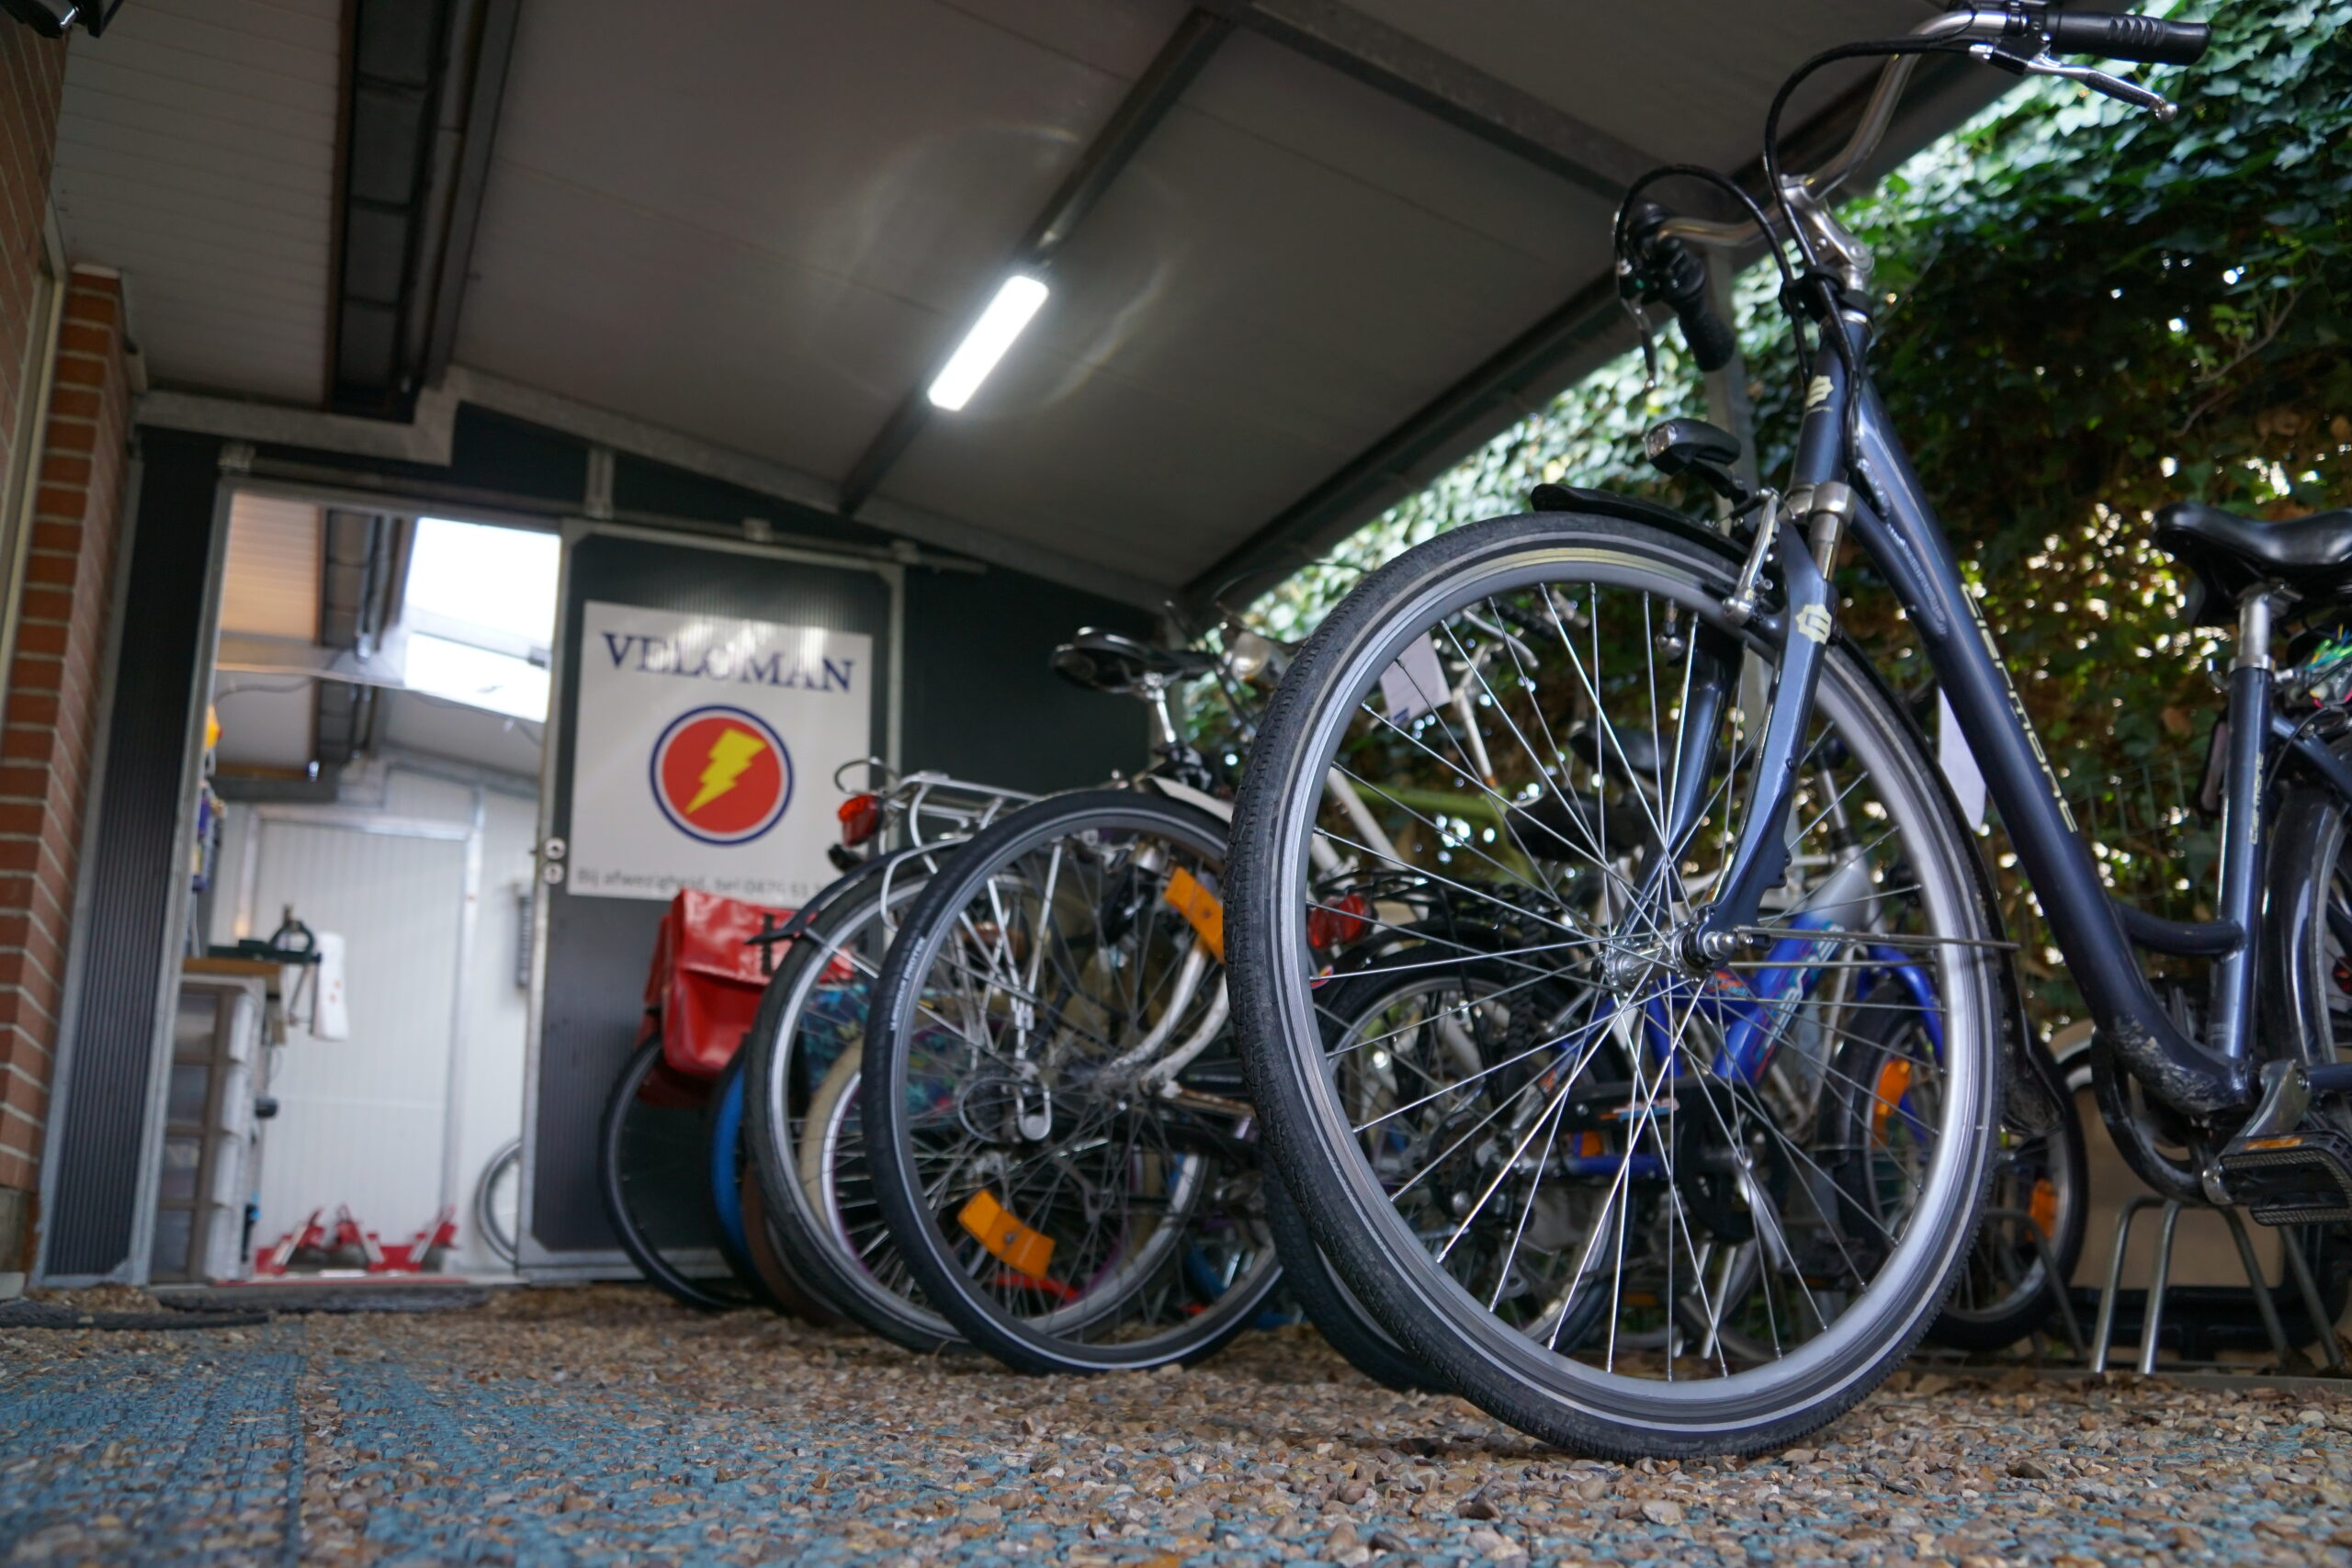 fietsherstel en onderhoud - veloman diensten